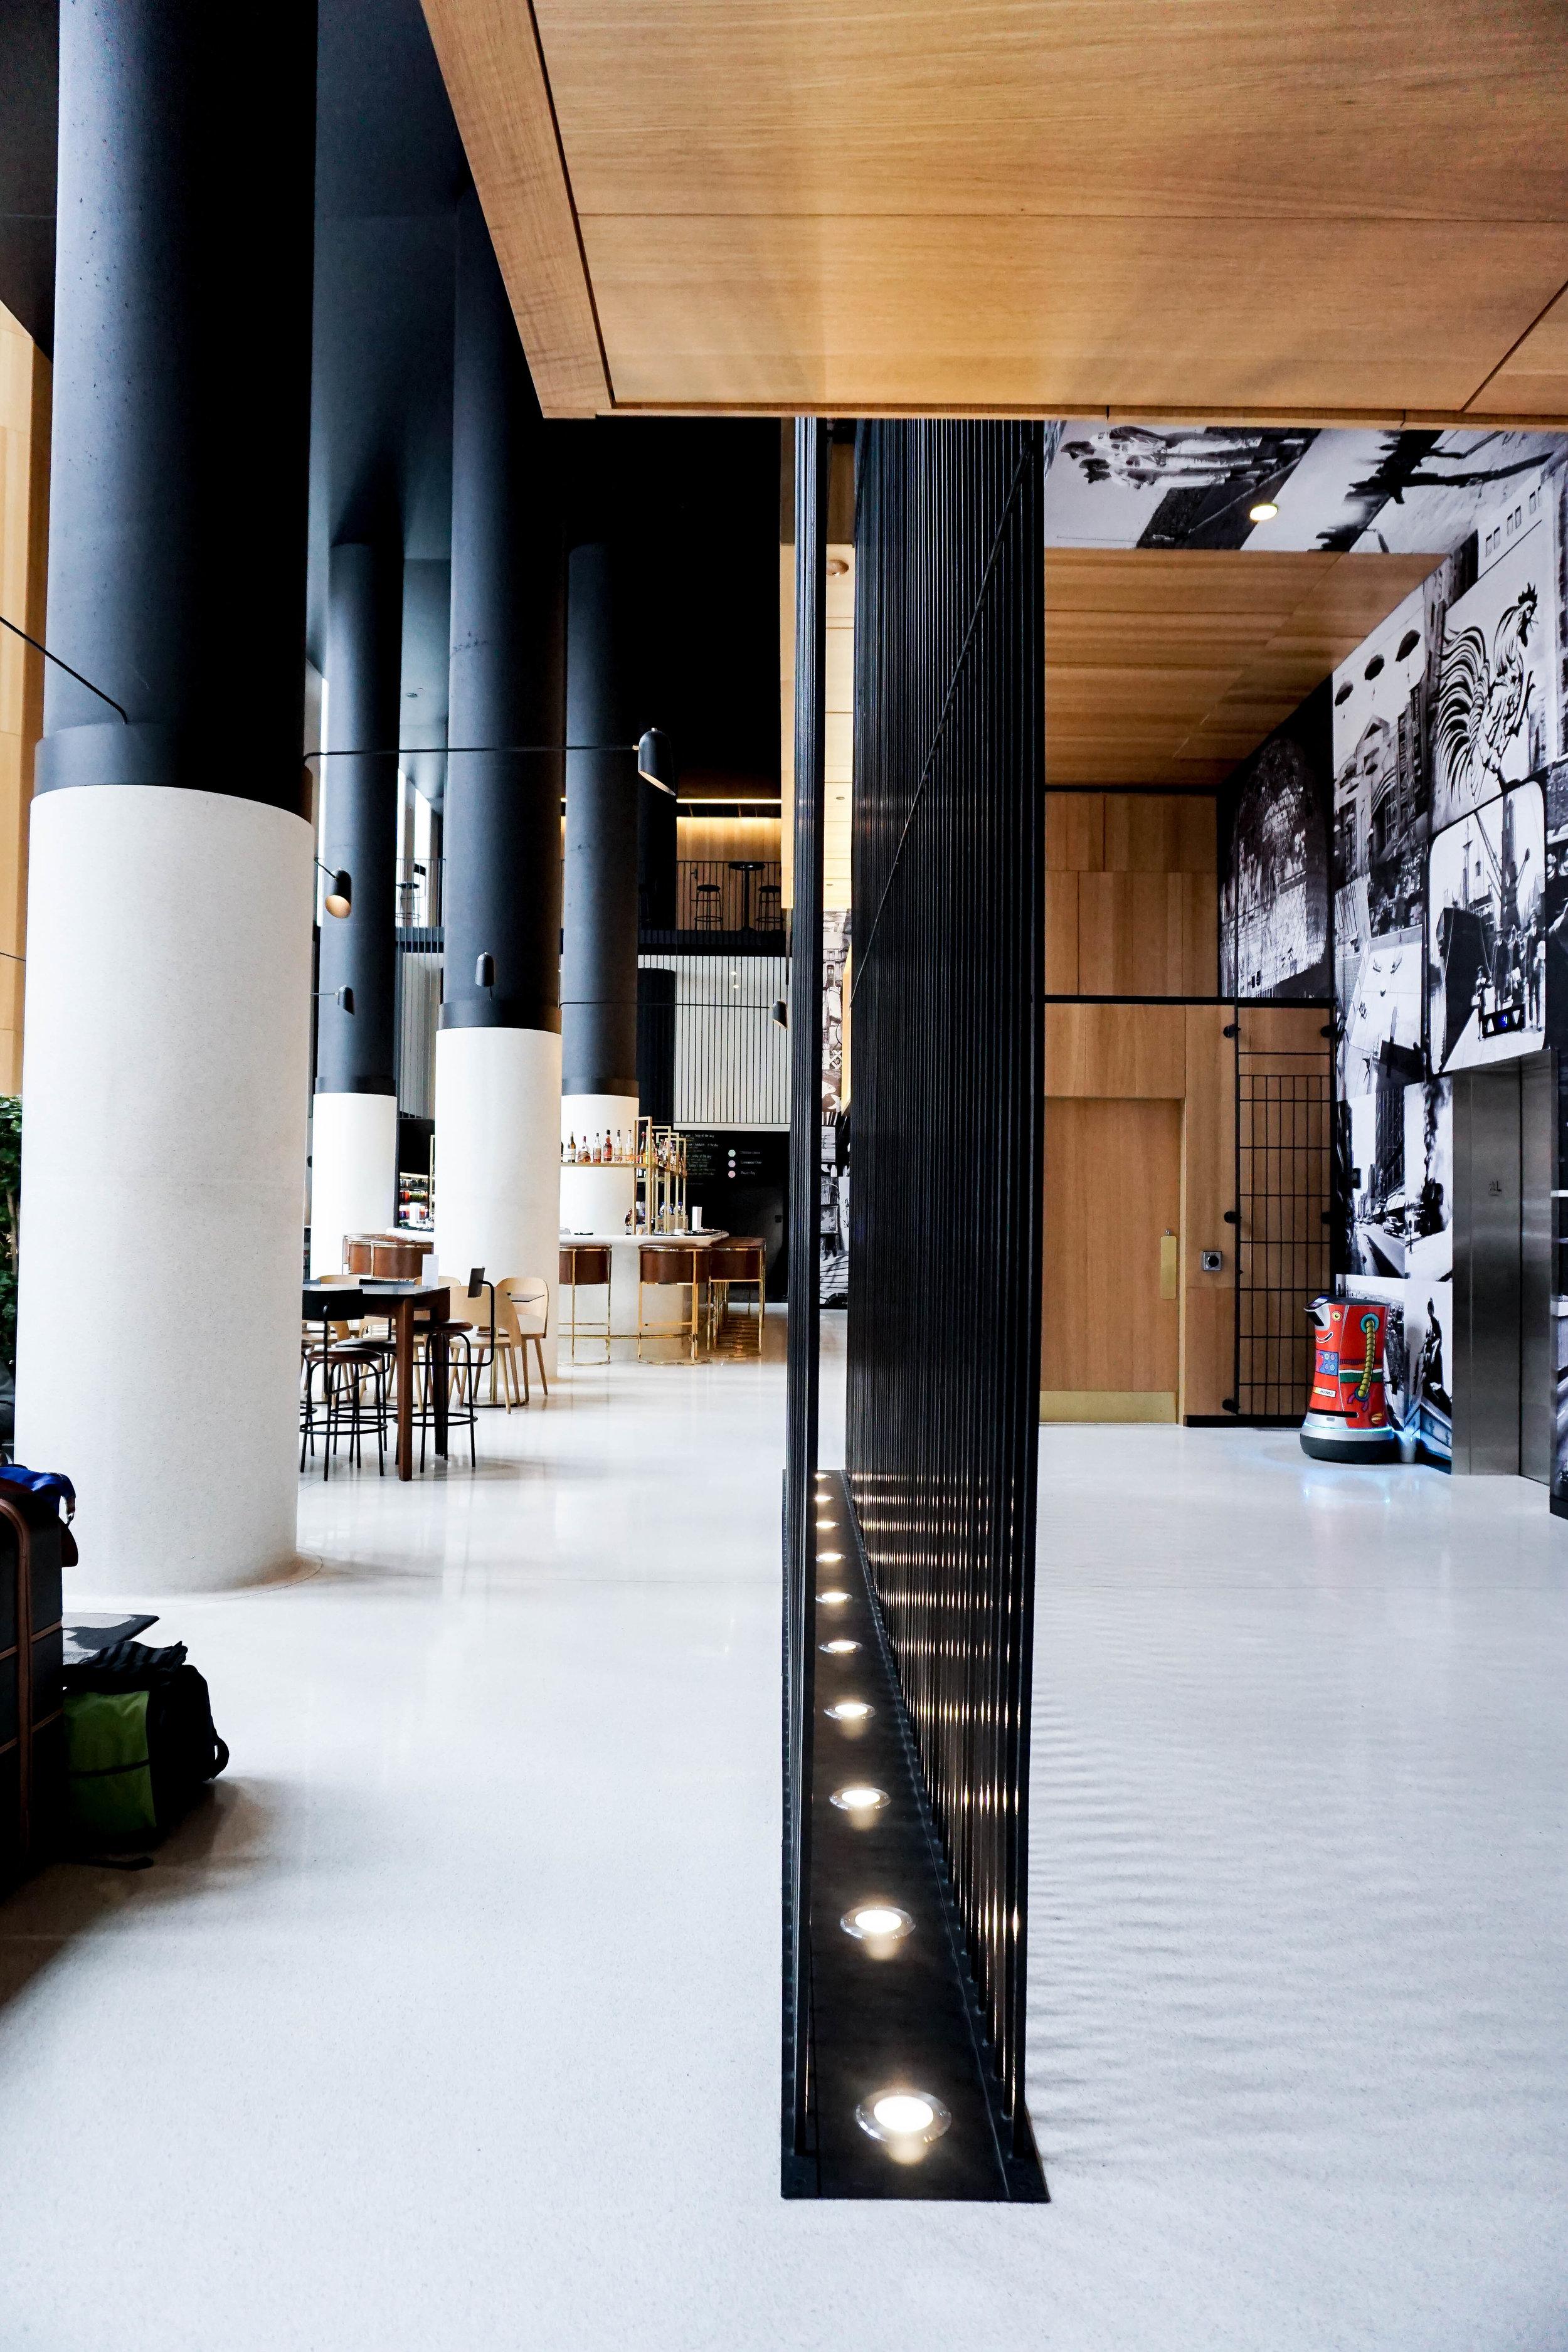 HOTEL MONVILLE, MONTREAL, QUEBEC